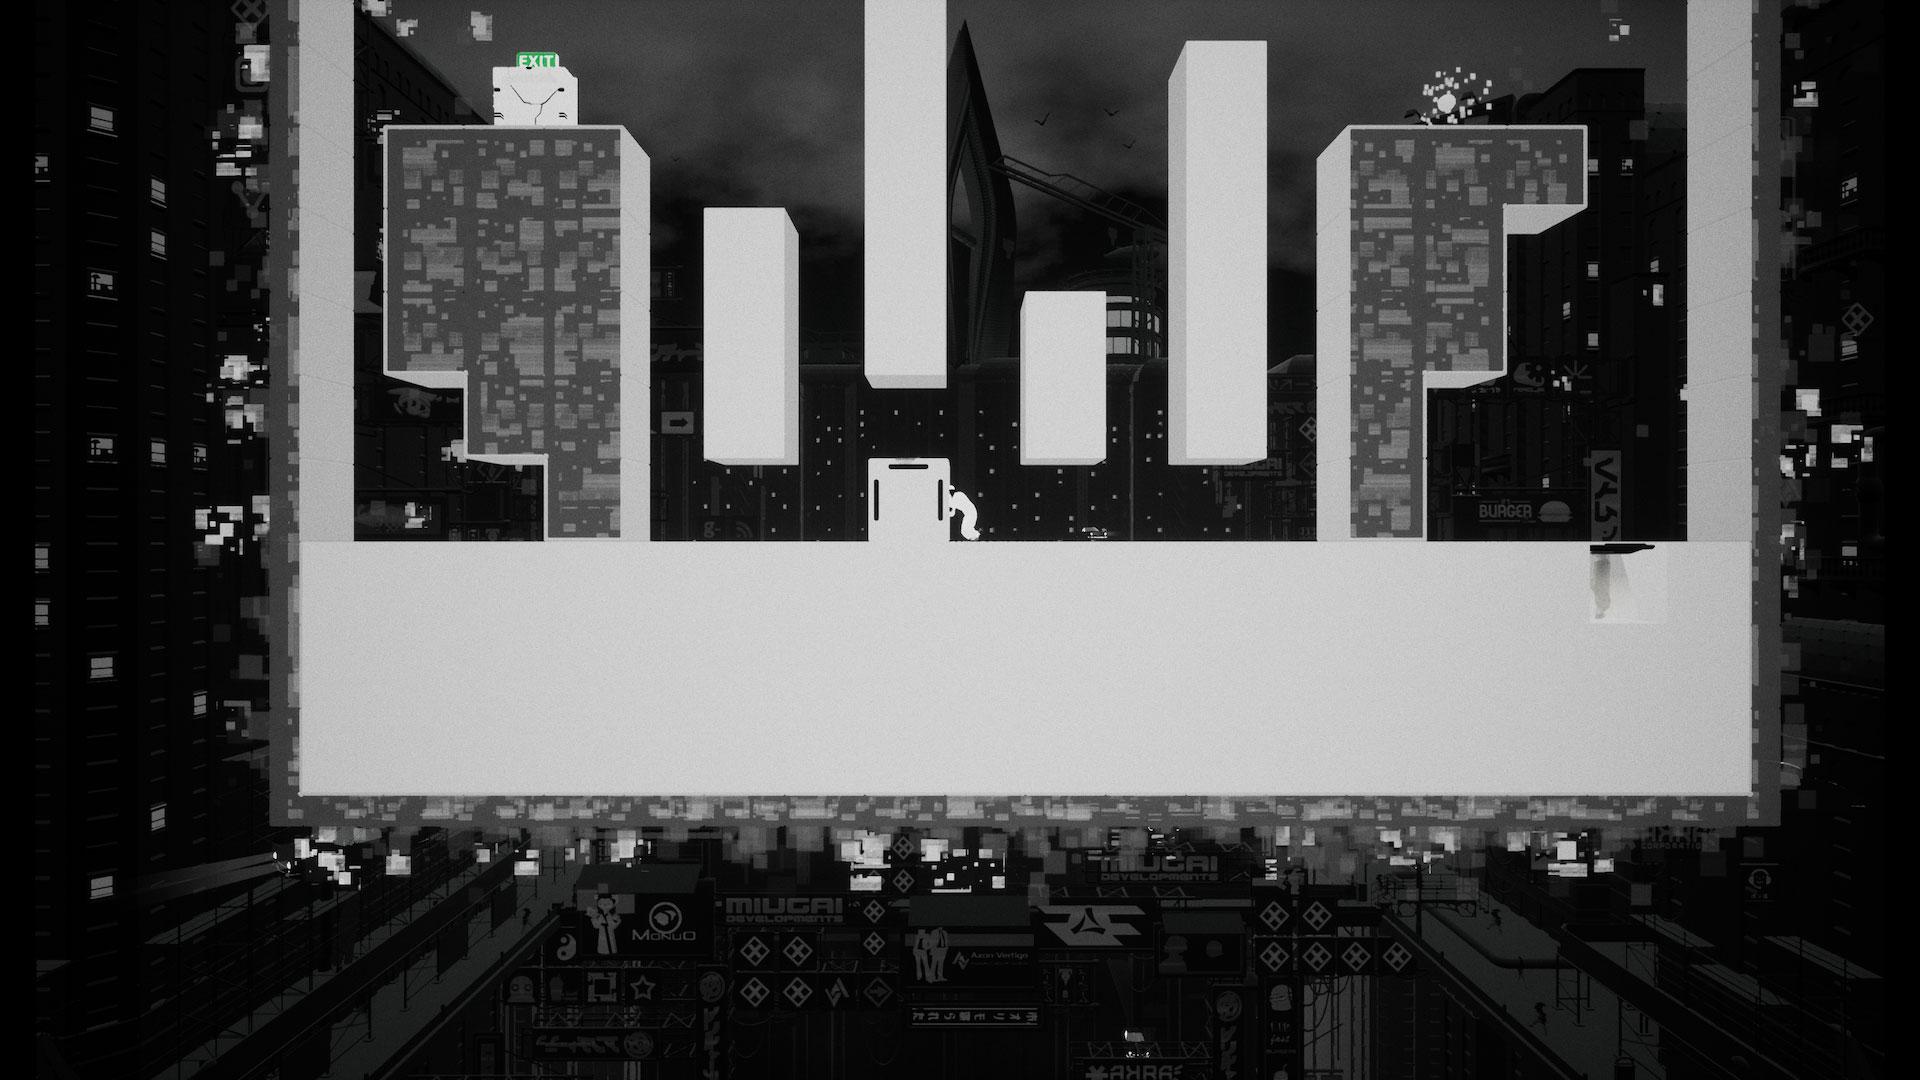 Shift Quantum — Resmi Oyun Müziği